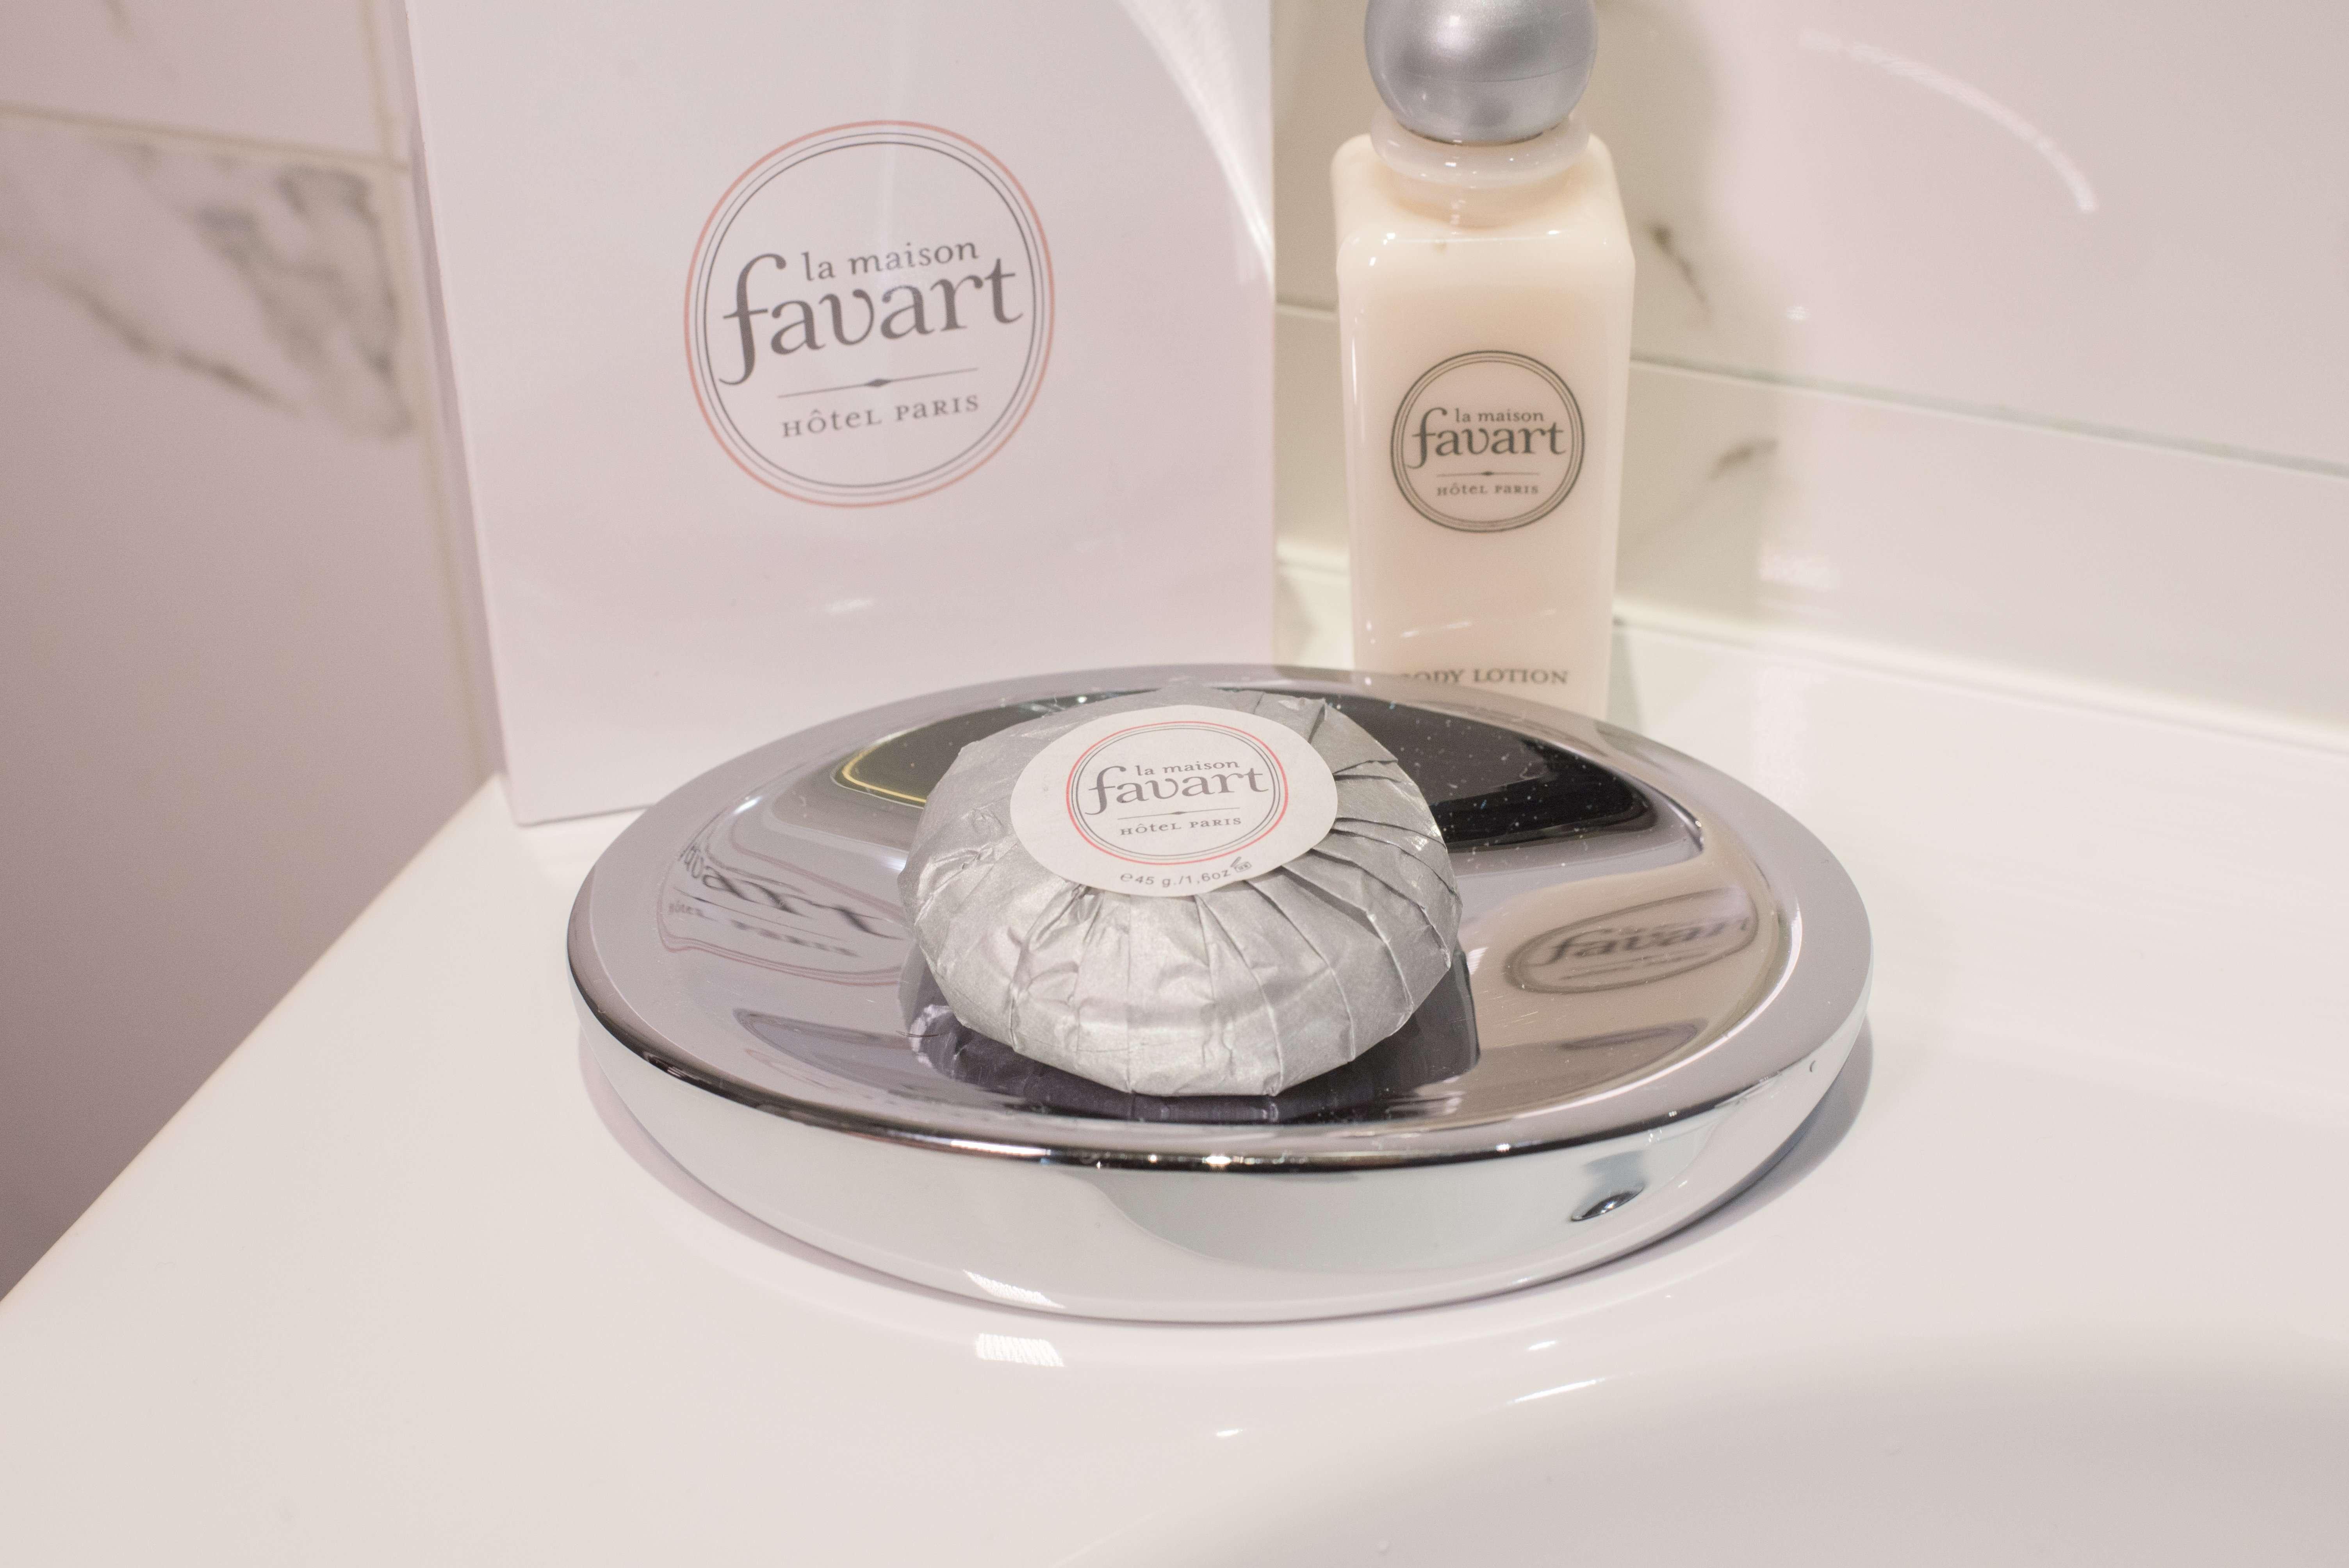 Branded soaps at La Maison Favart